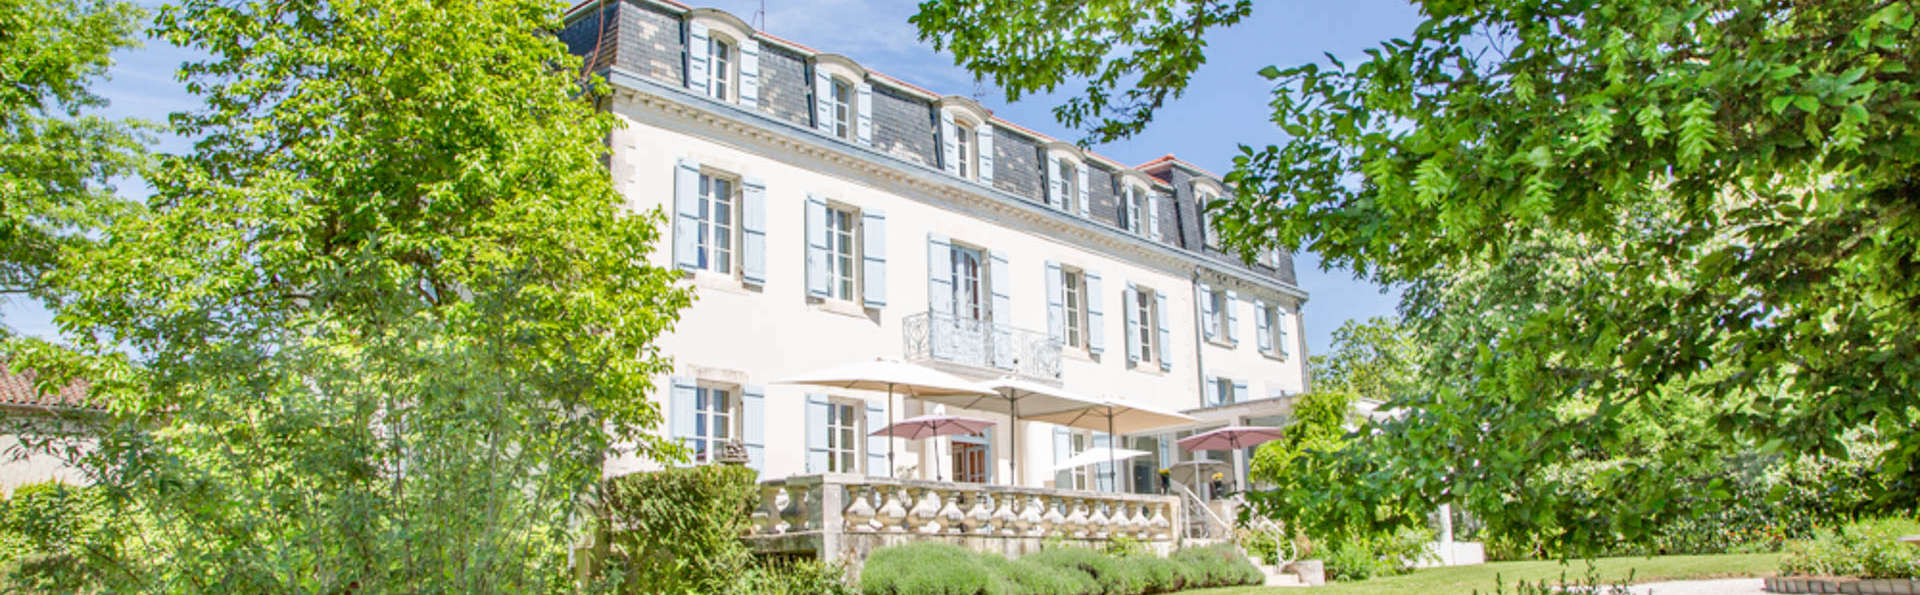 Château Bellevue  - EDIT_NEW_FRONT.jpg